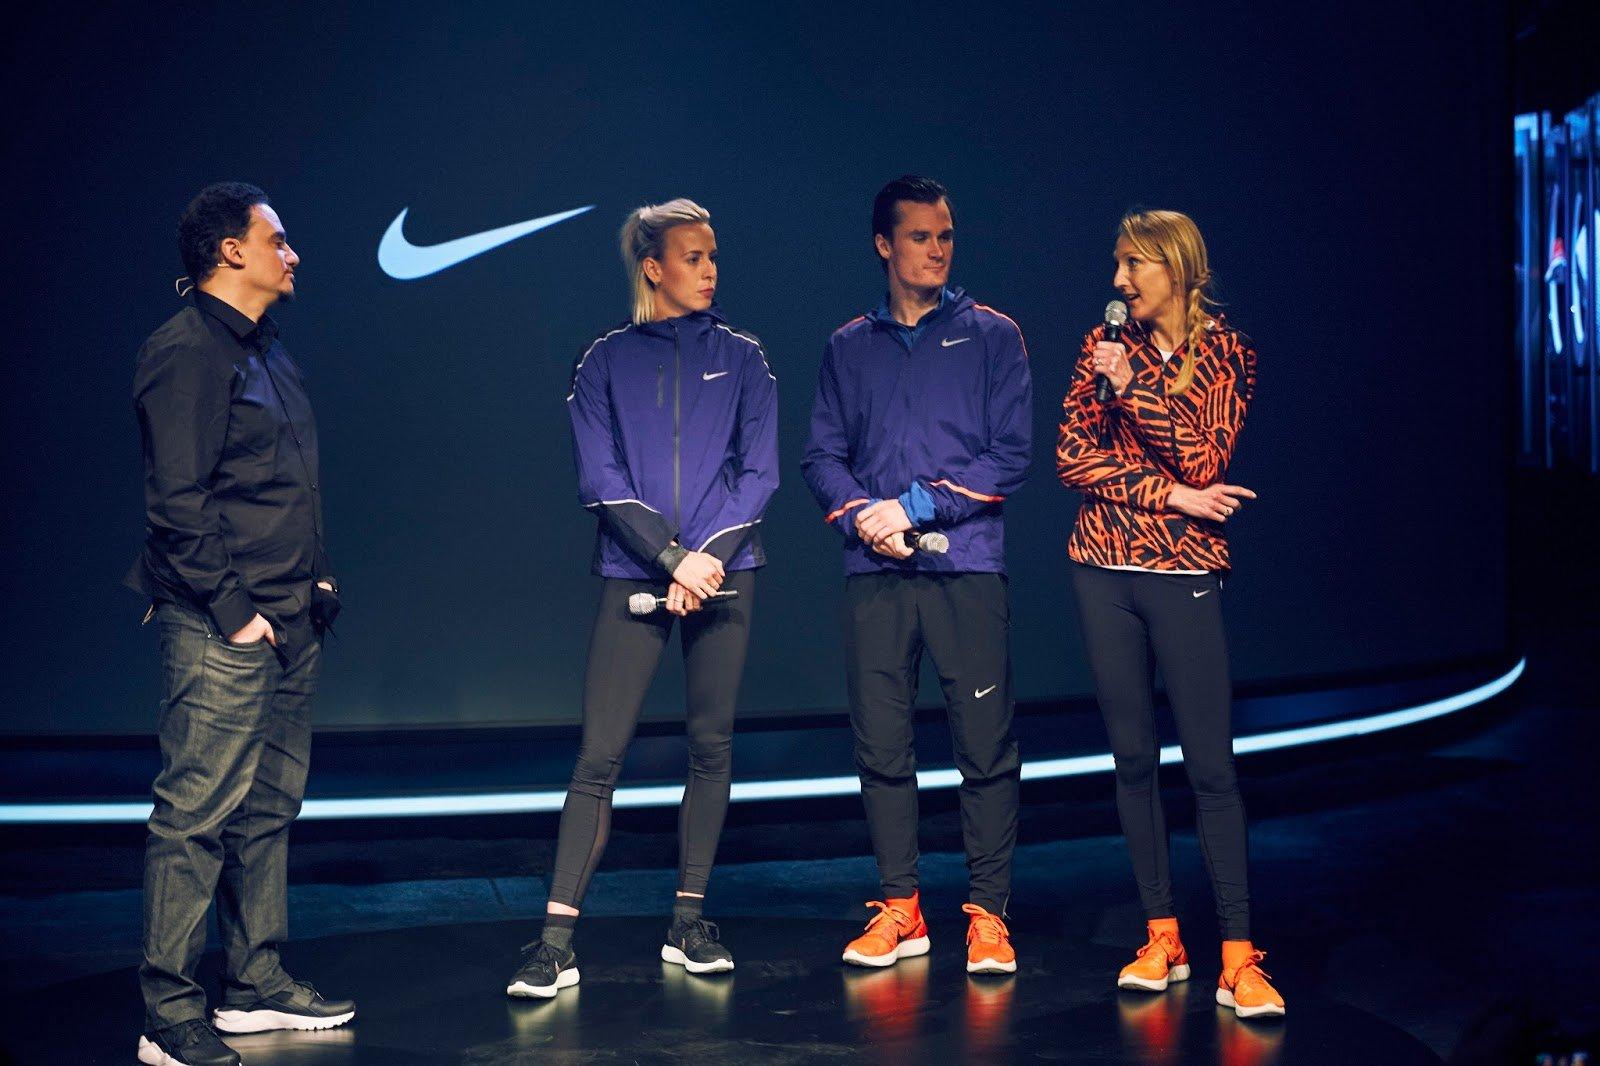 Athlètes Nike